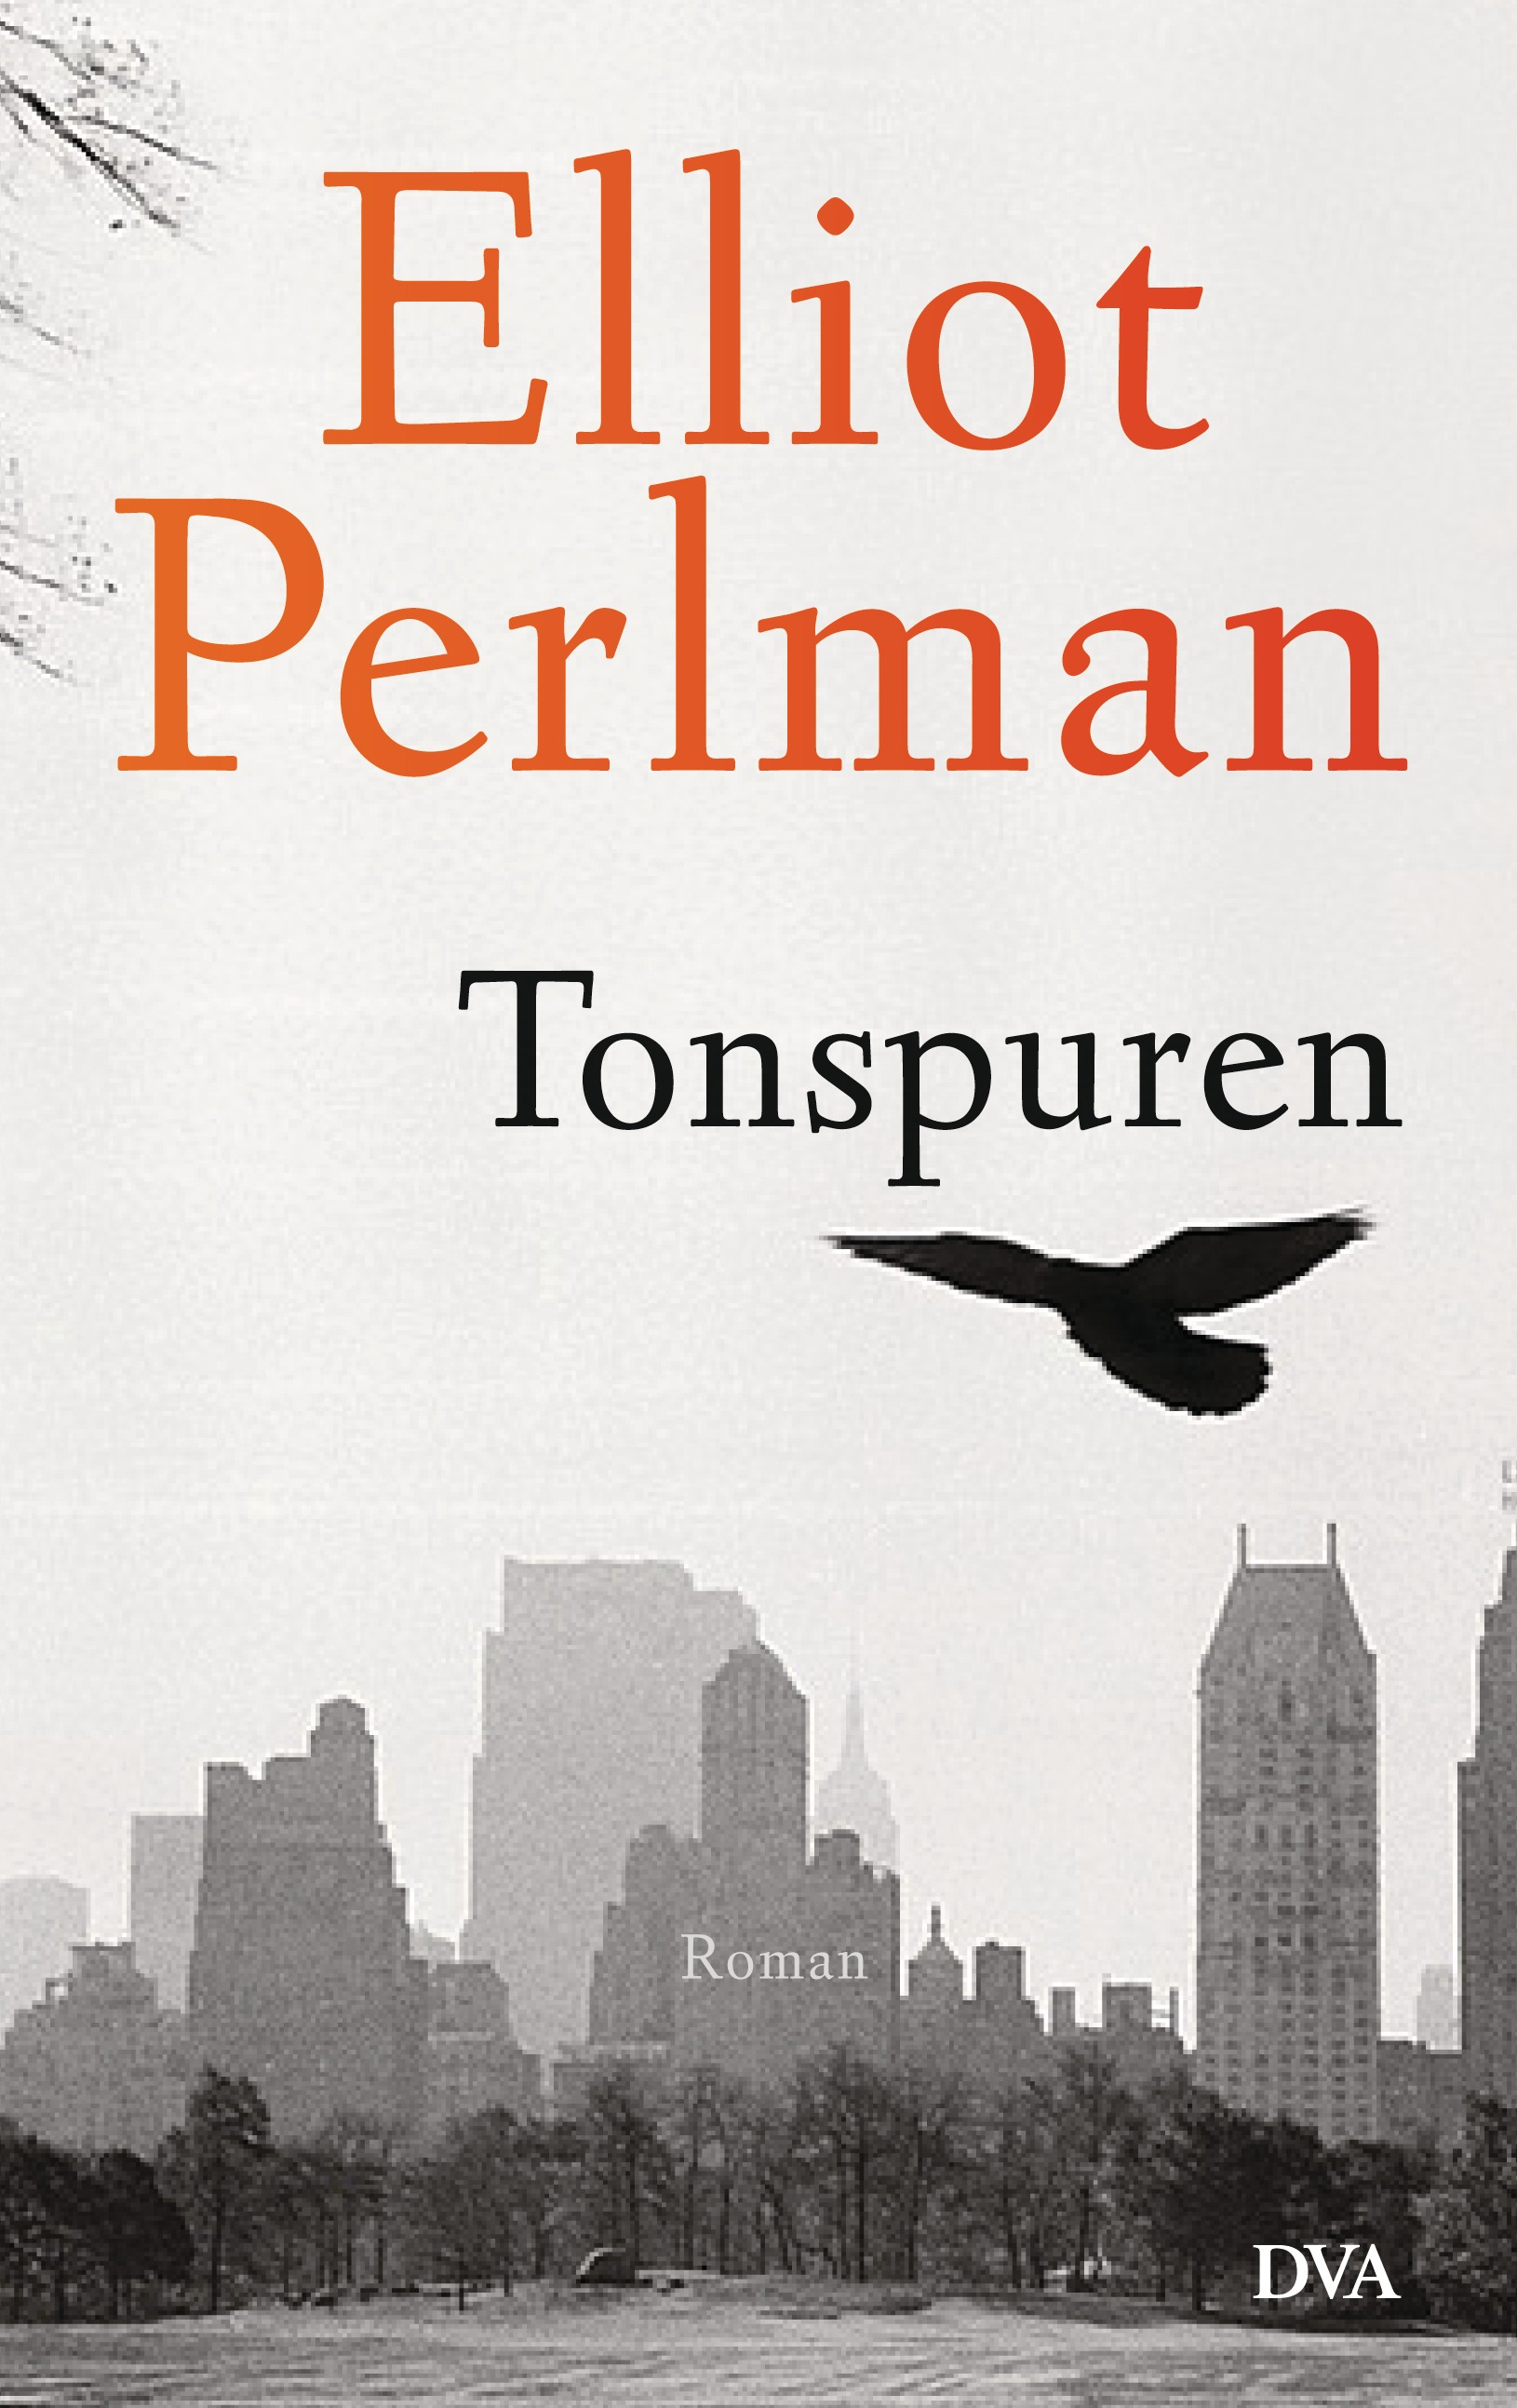 Dritter Roman von Elliot Perlman erscheint am 9. April